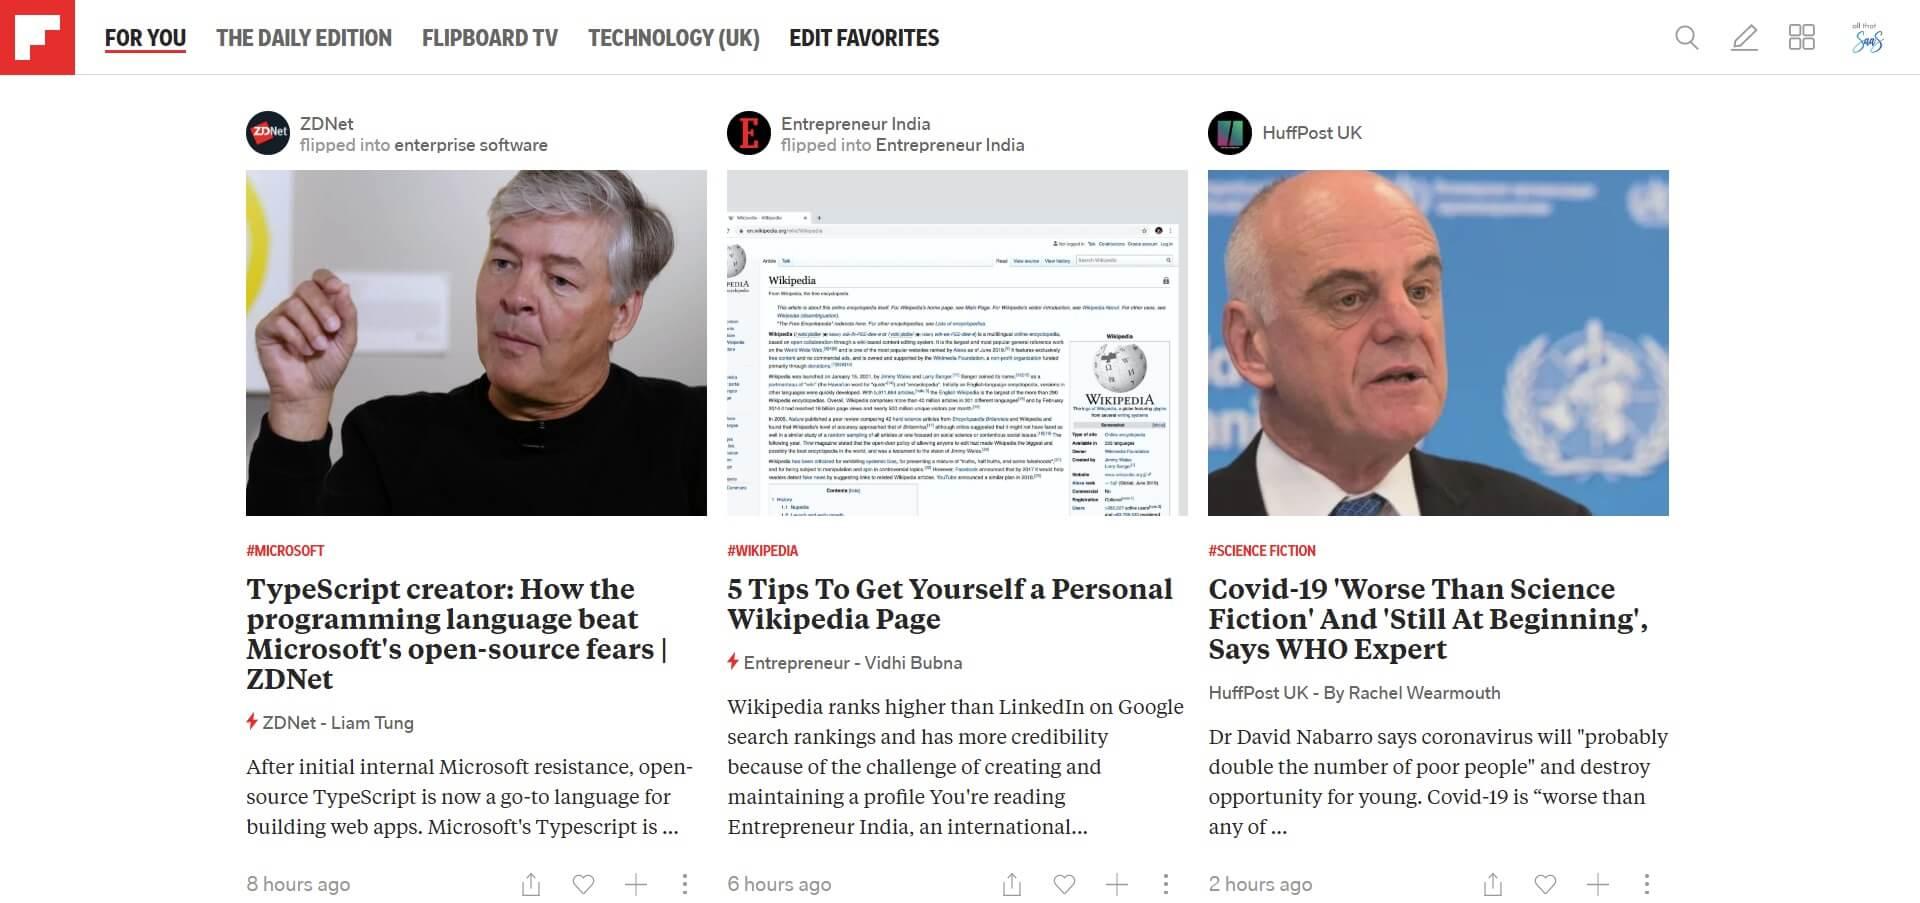 flipboard news main